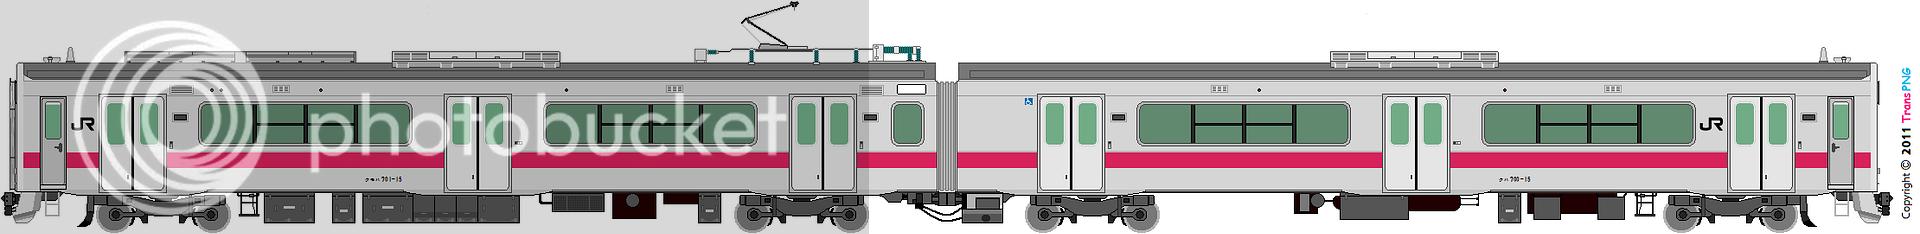 Train 2268